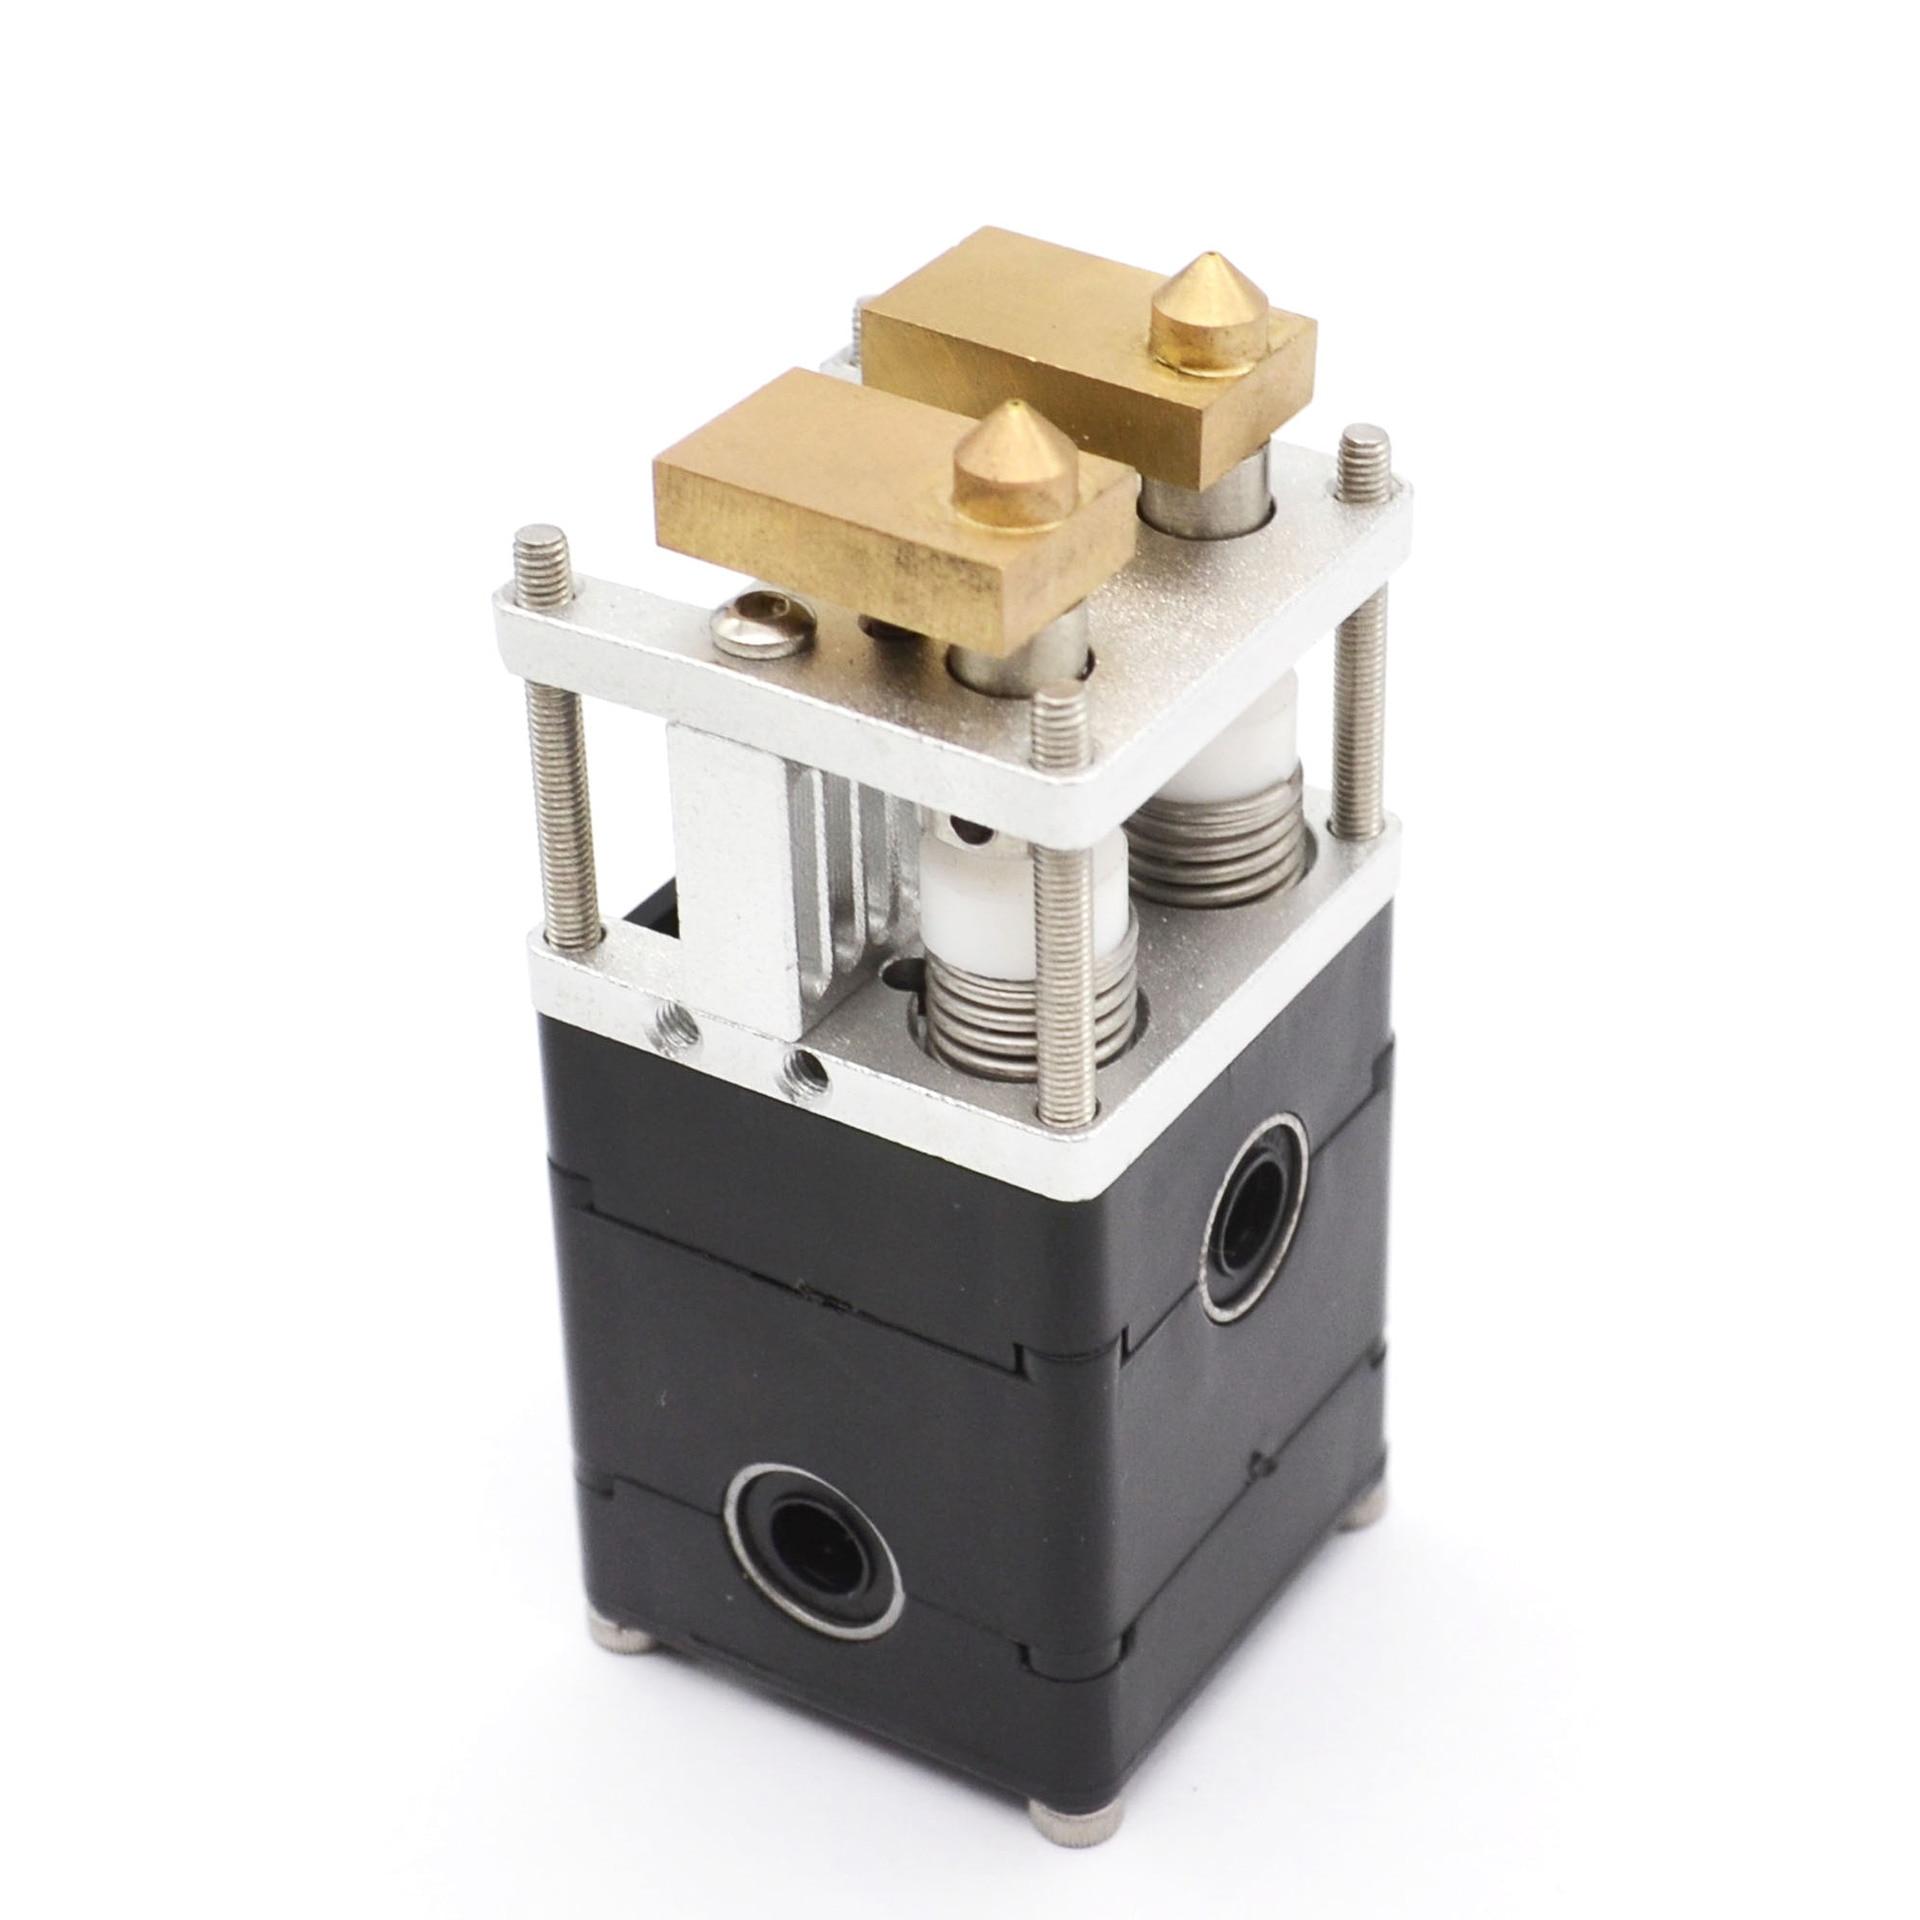 3D Printer parts Ulimaker 2 UM2 Dual print head Extruder full kit with Coupling 0.4mm Nozzle for 1.75/3.0mm filament отсутствует звезды и советы 51 2017